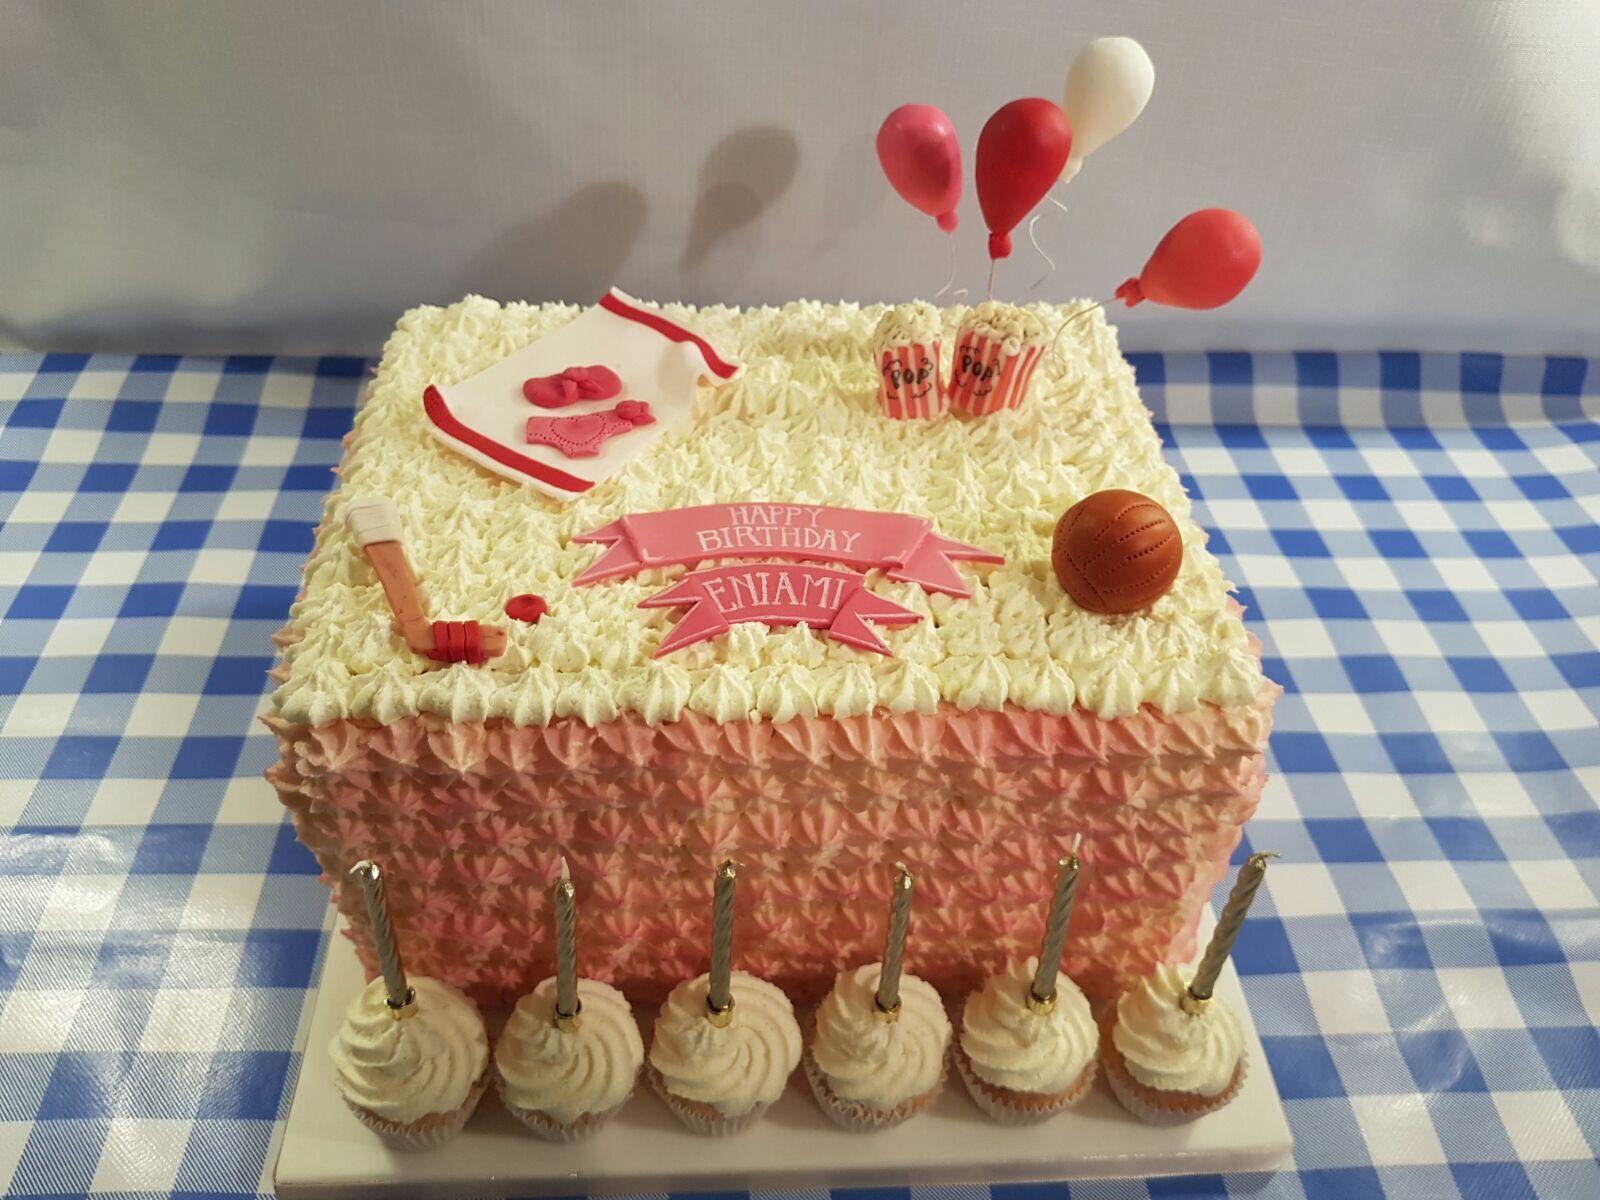 Yum yum buttercream birthday cake deliciousness 🎂 | C a k e s ...